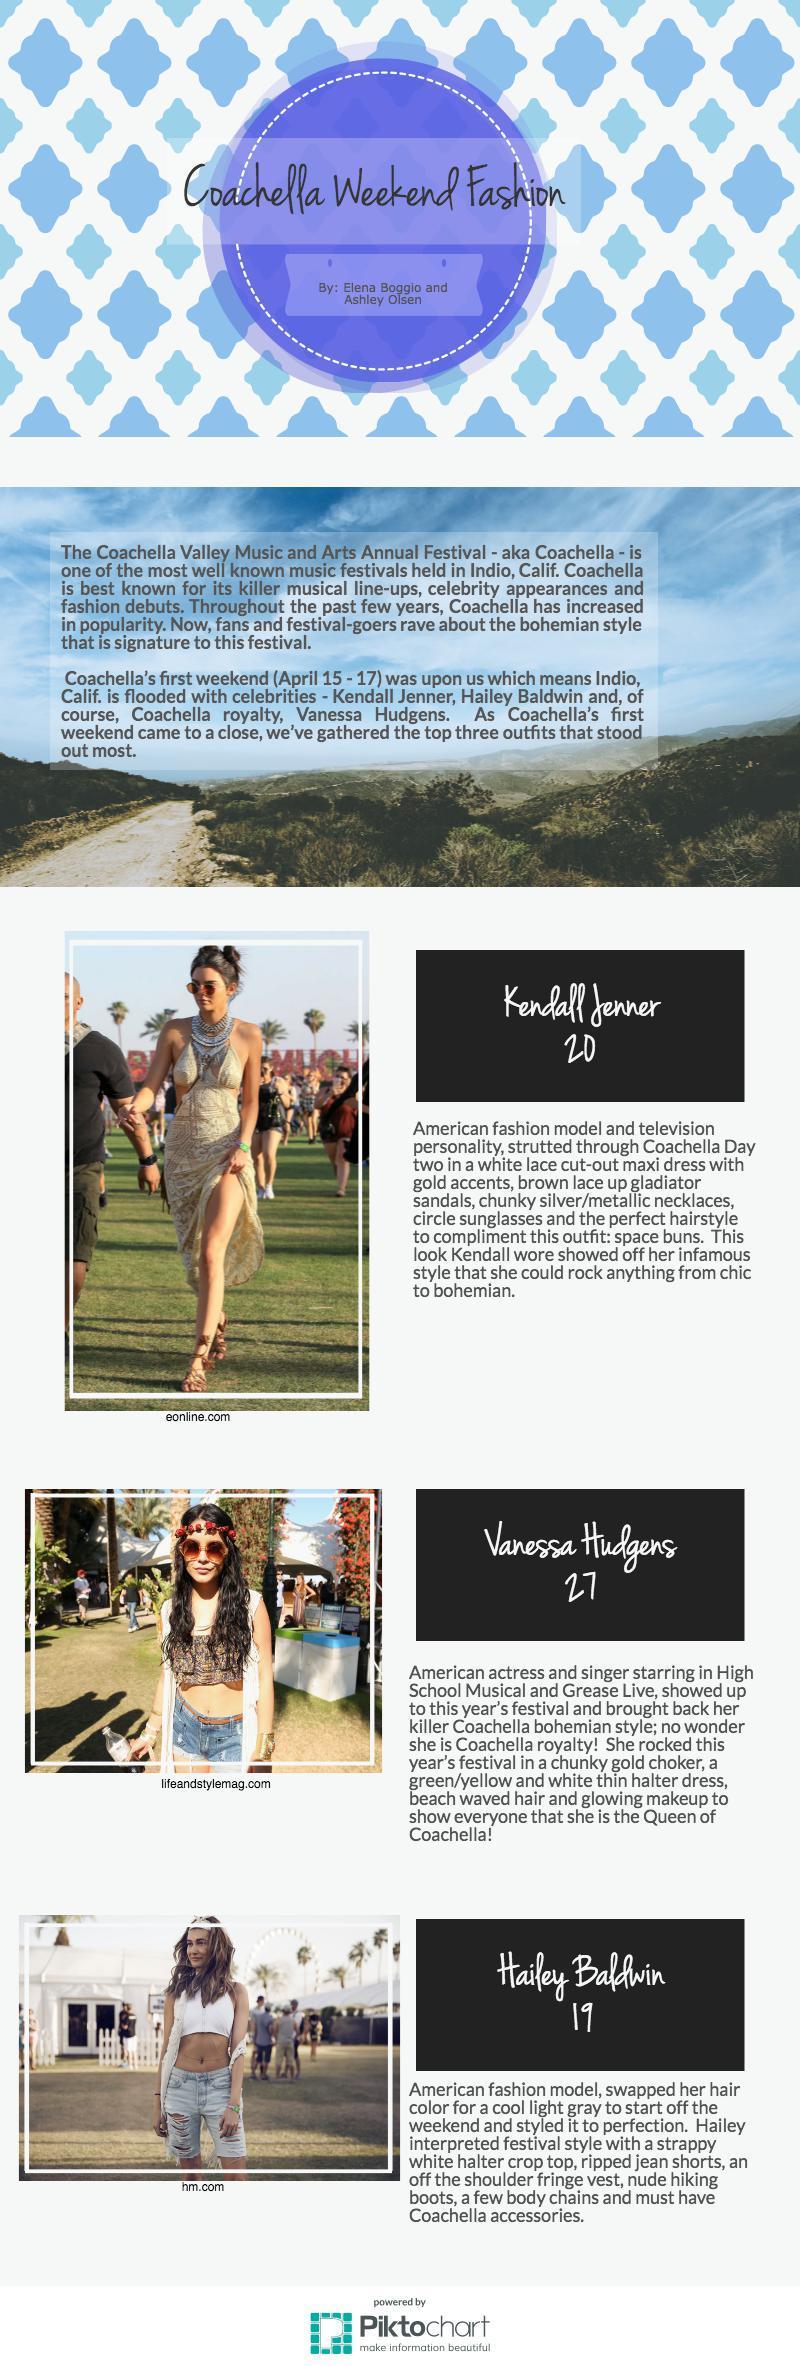 coachella-weekend-fashion